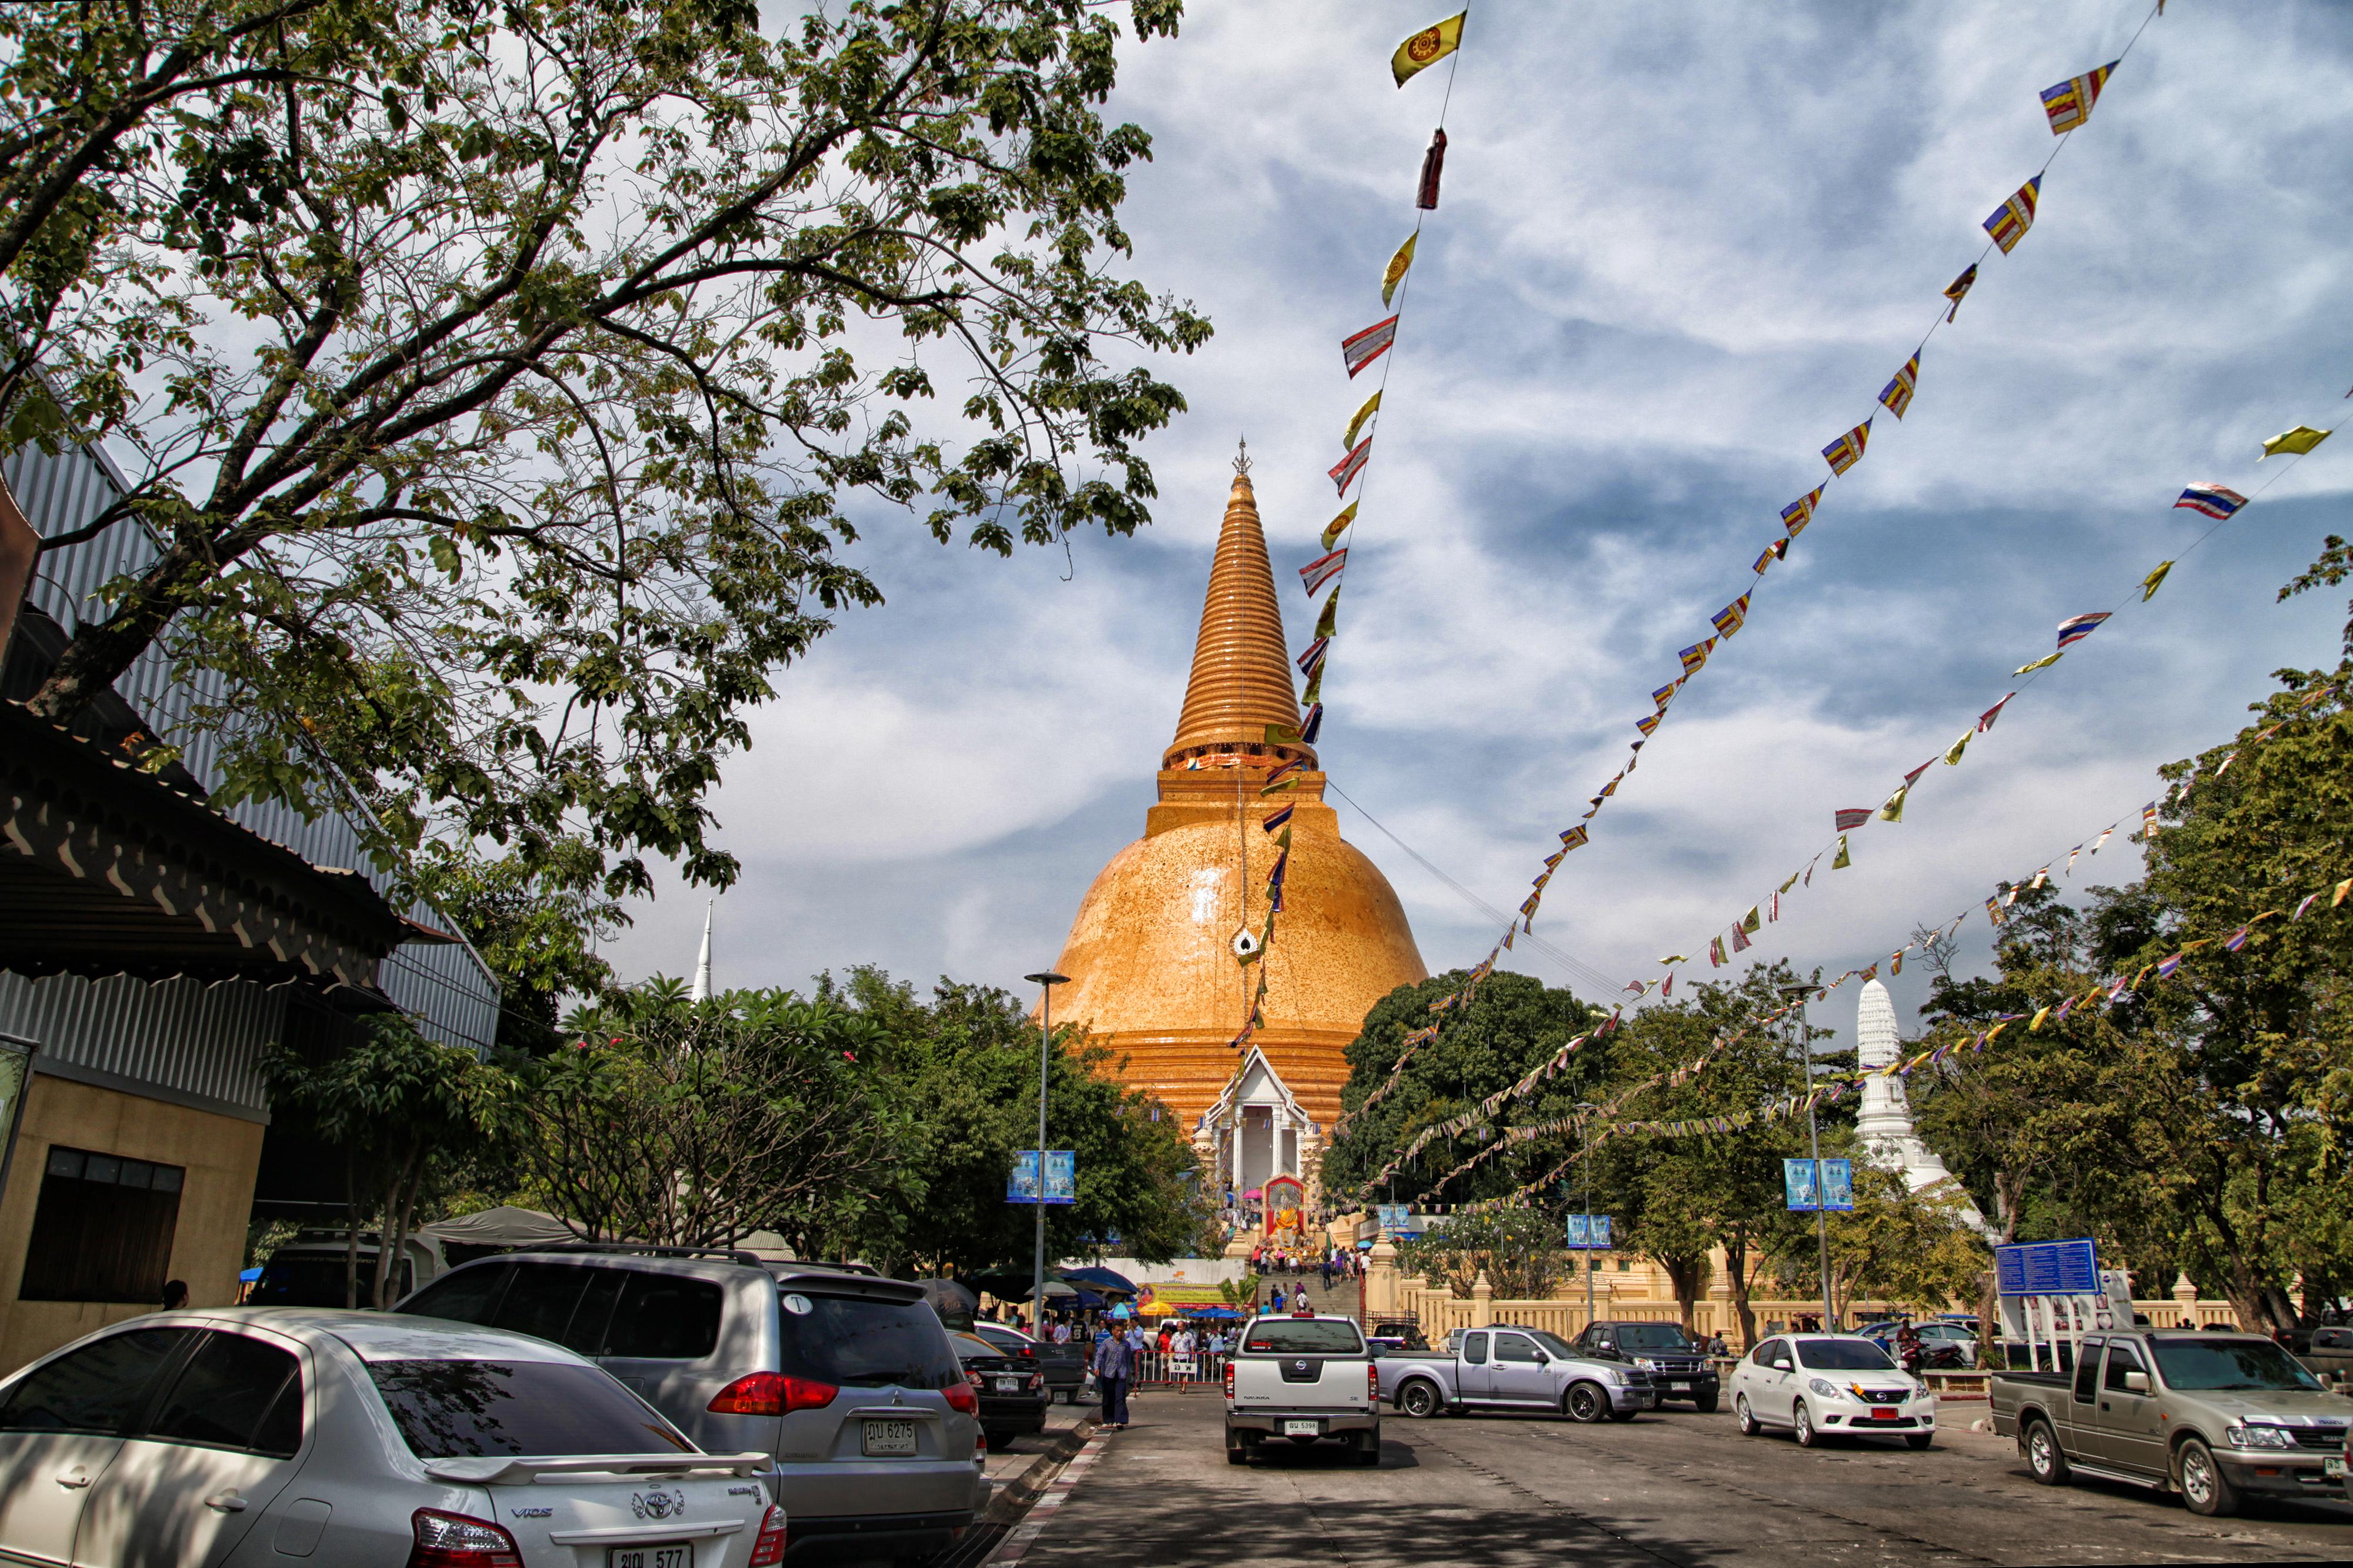 File:Phra Pathom Chedi 03.jpg - Wikimedia Commons